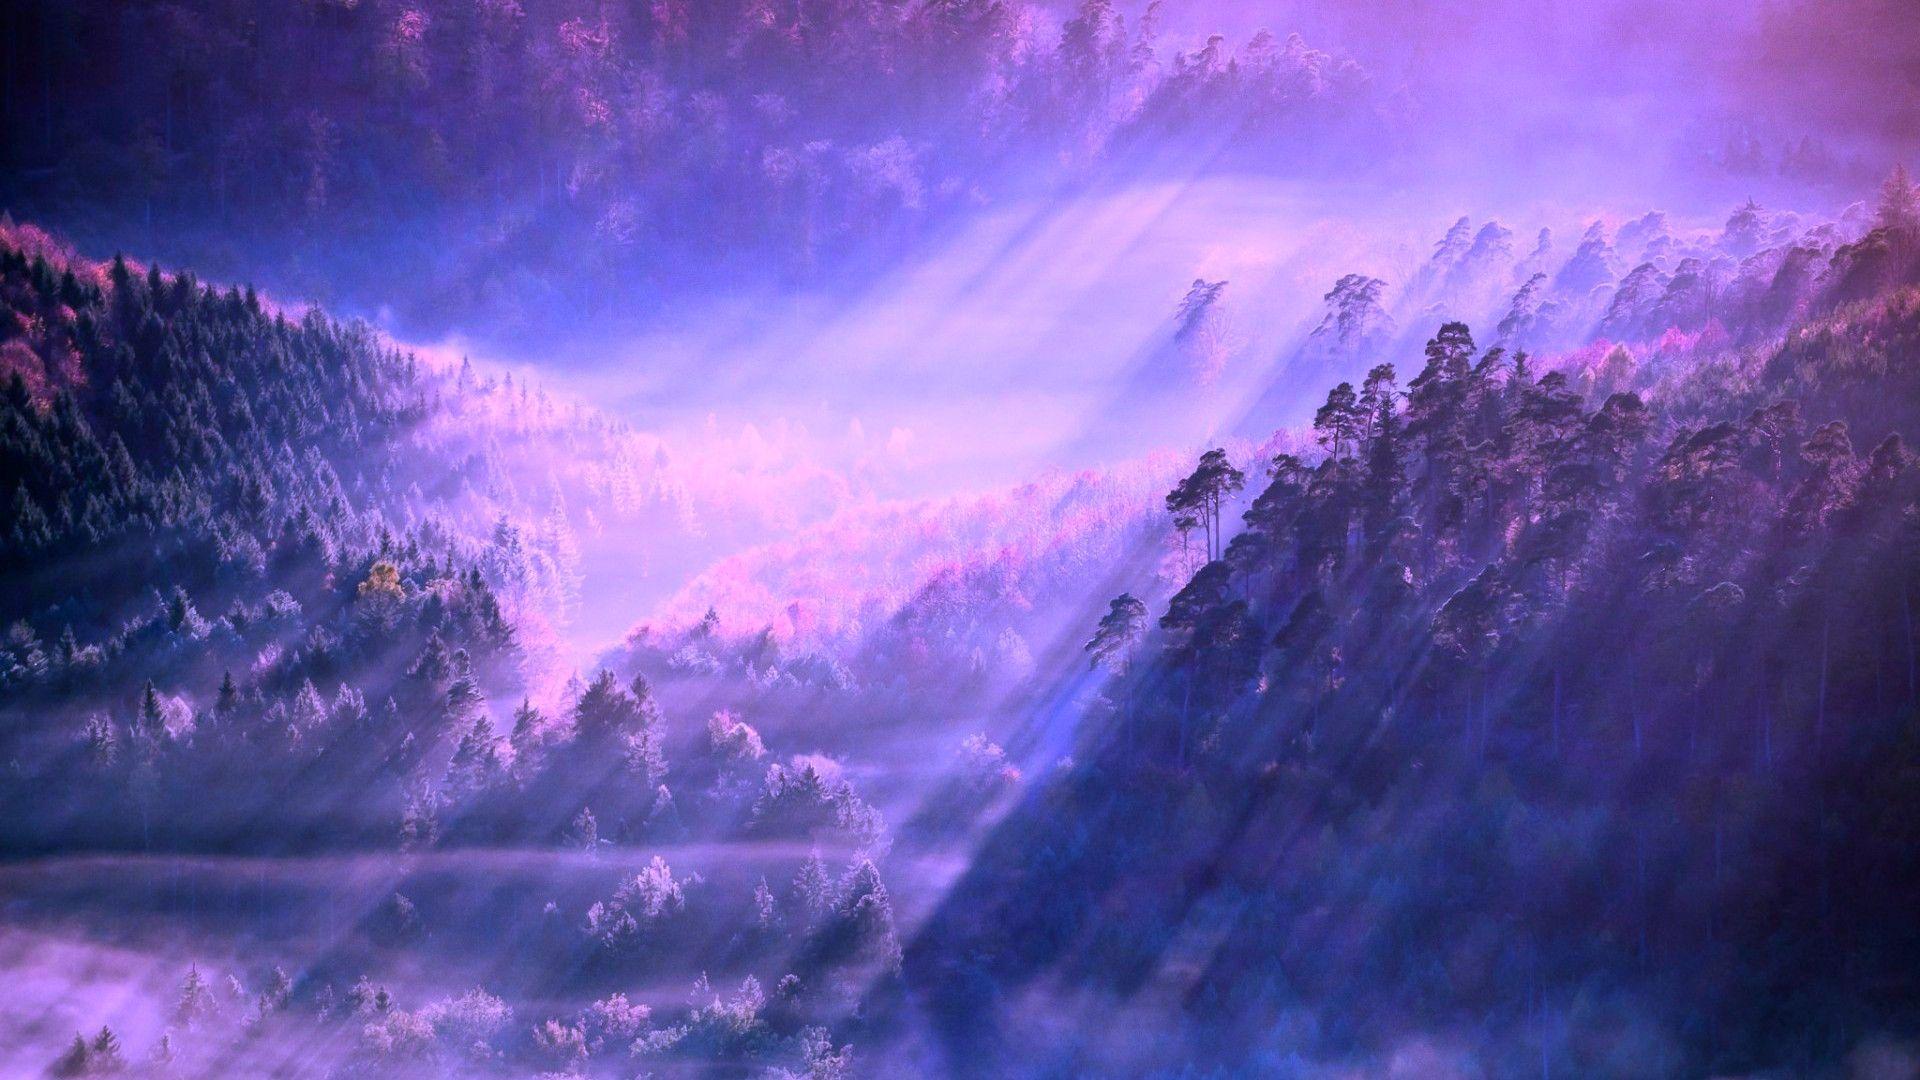 1366x768 aesthetic anime wallpaper laptop hd. Purple Aesthetic PC HD Wallpapers - Wallpaper Cave